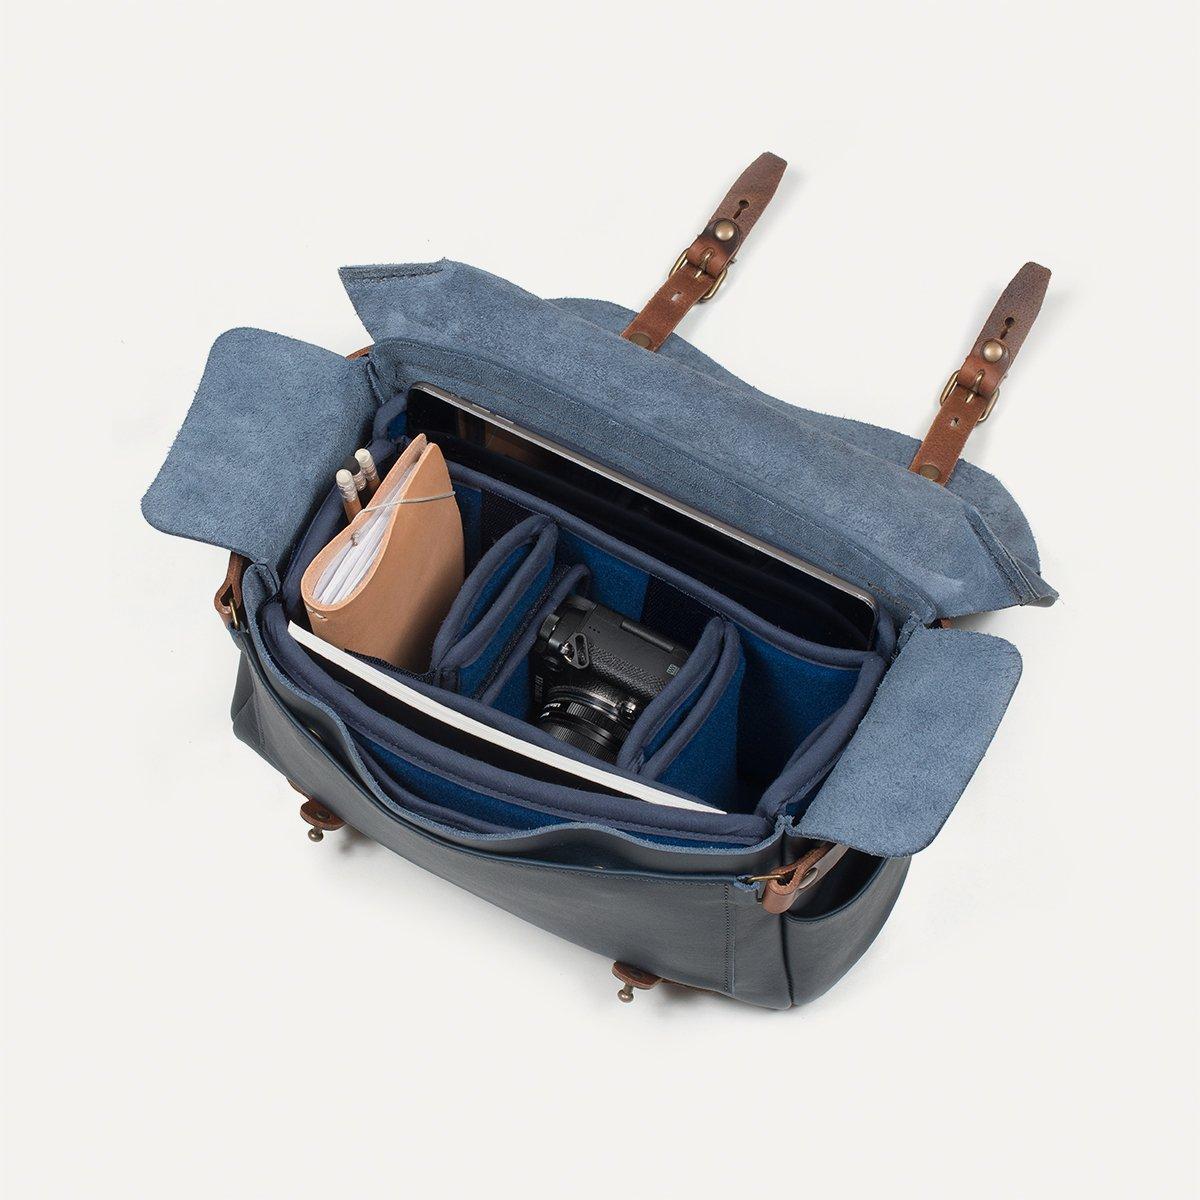 sac photo bologne olympus x bleu de chauffe bleu de. Black Bedroom Furniture Sets. Home Design Ideas